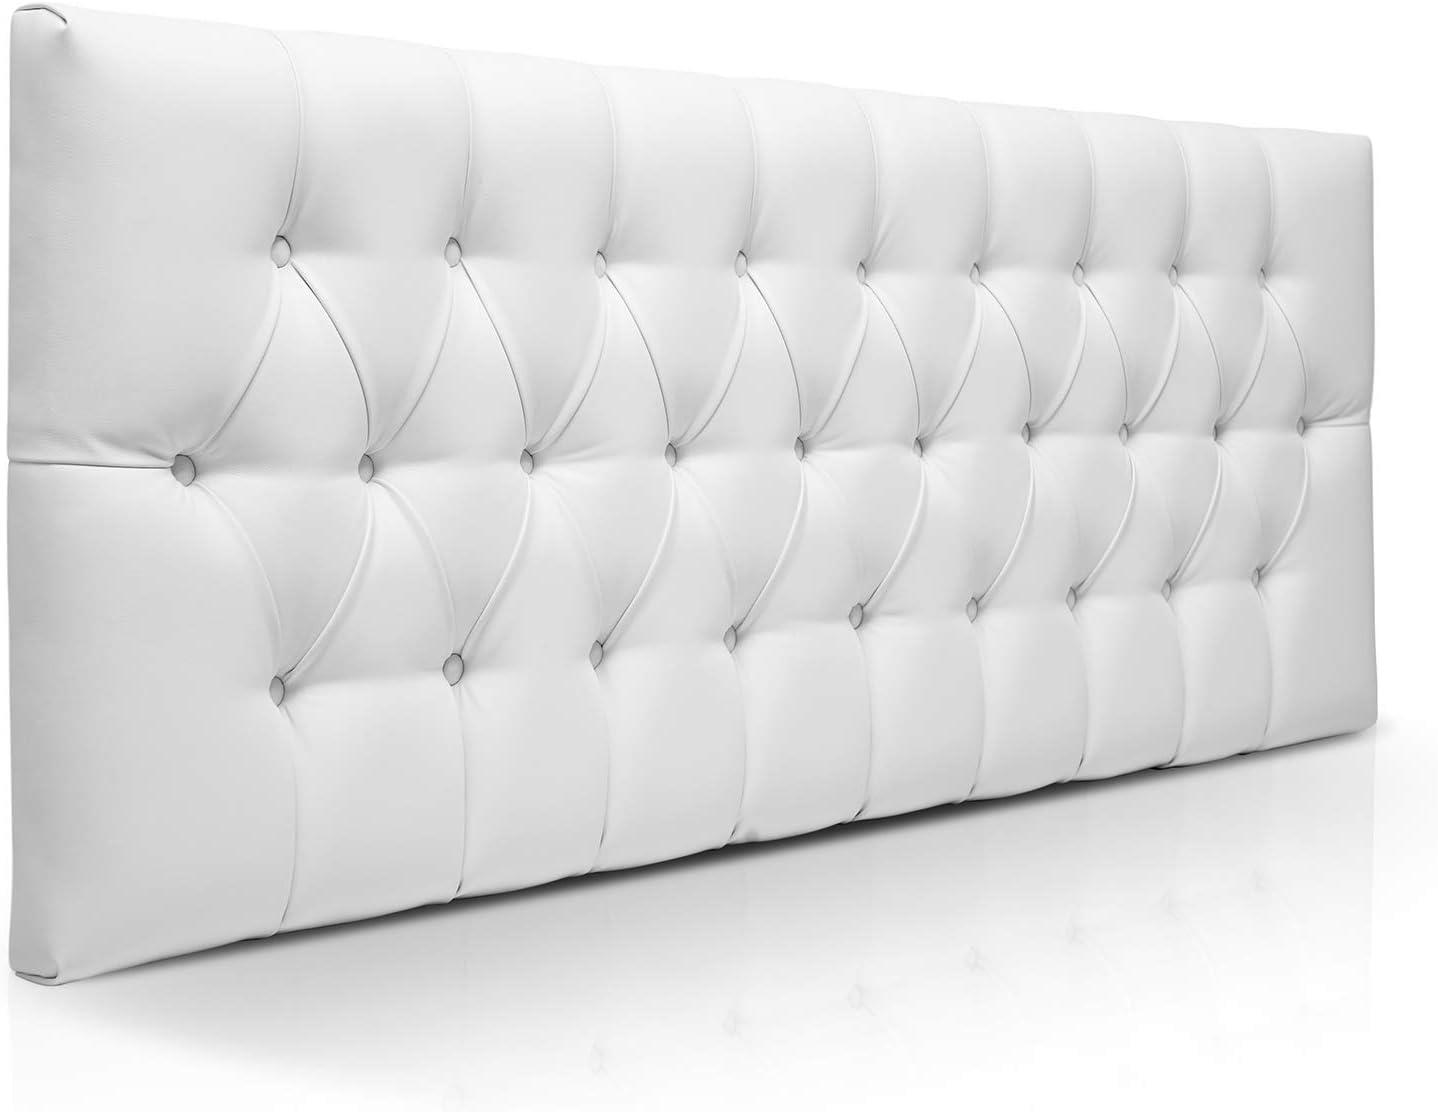 SUENOSZZZ-ESPECIALISTAS DEL DESCANSO Cabecero de Cama de 90 Modelo Copenhague, Color Blanco 100x57 | Cabezal Madera de Gran Acolchado con capitoné tapizado en Polipiel